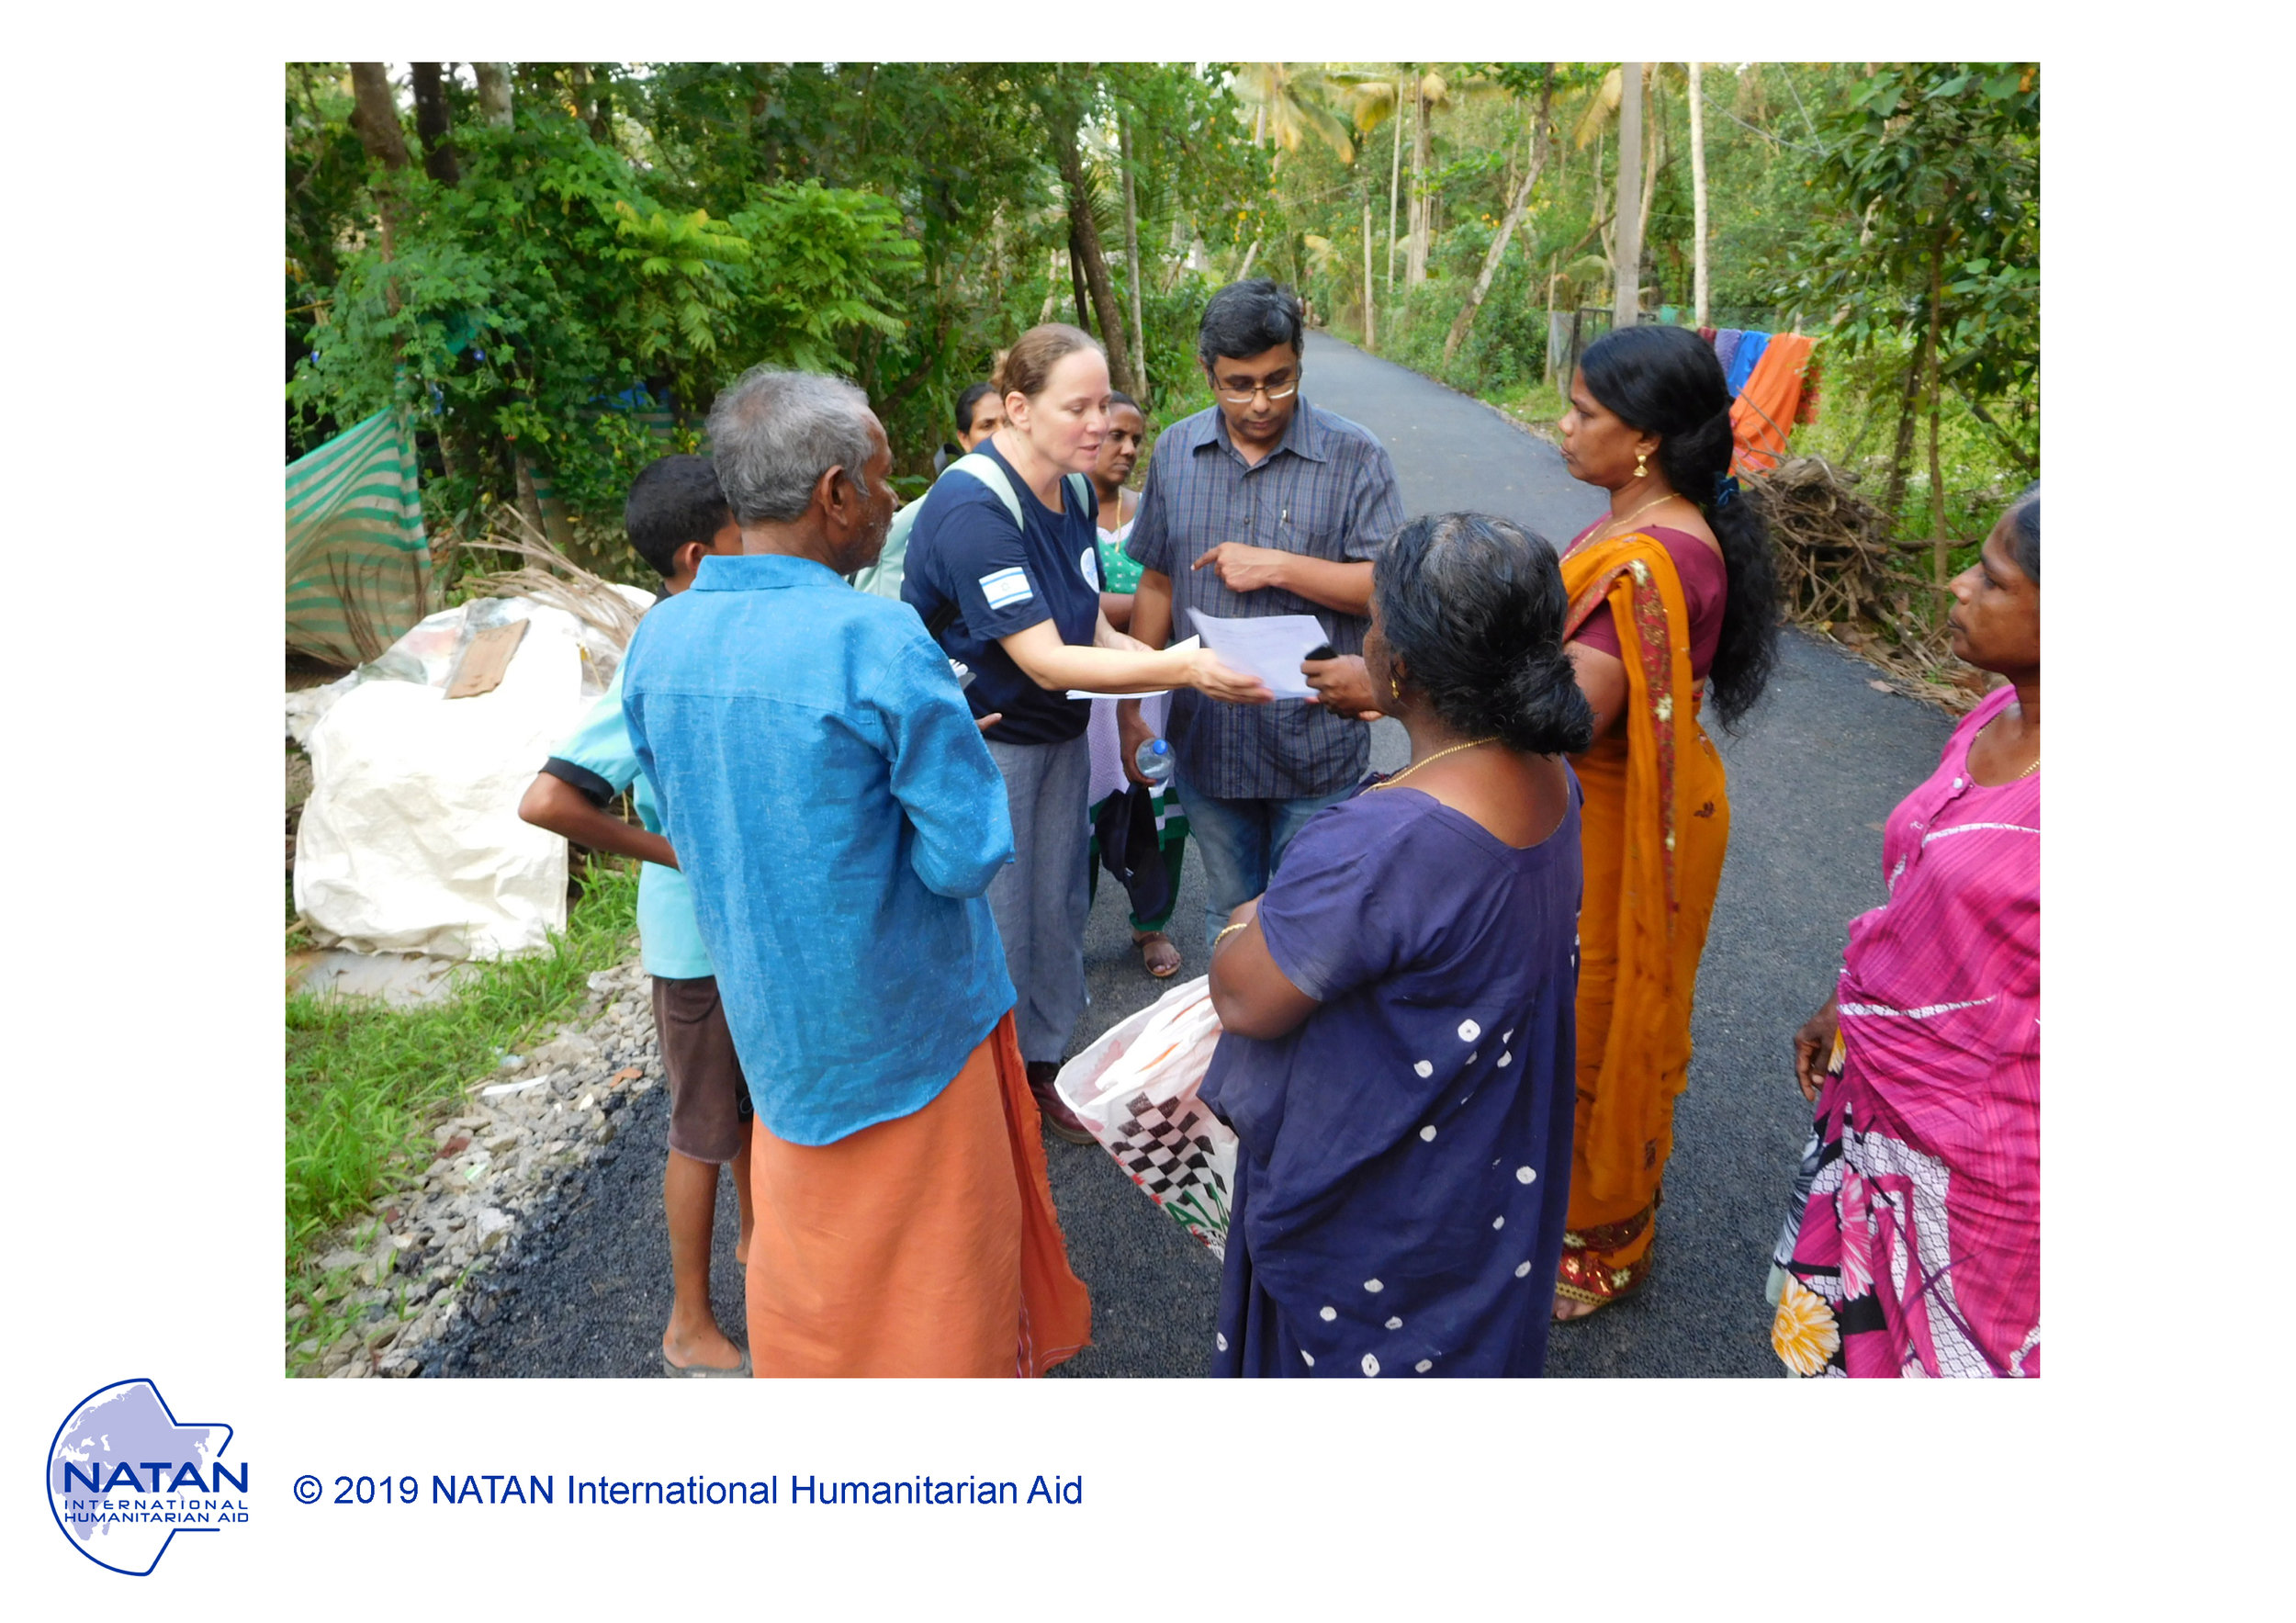 india 2018 - members of natan assessment team speak with survivors of monsoon floods in kerala region,